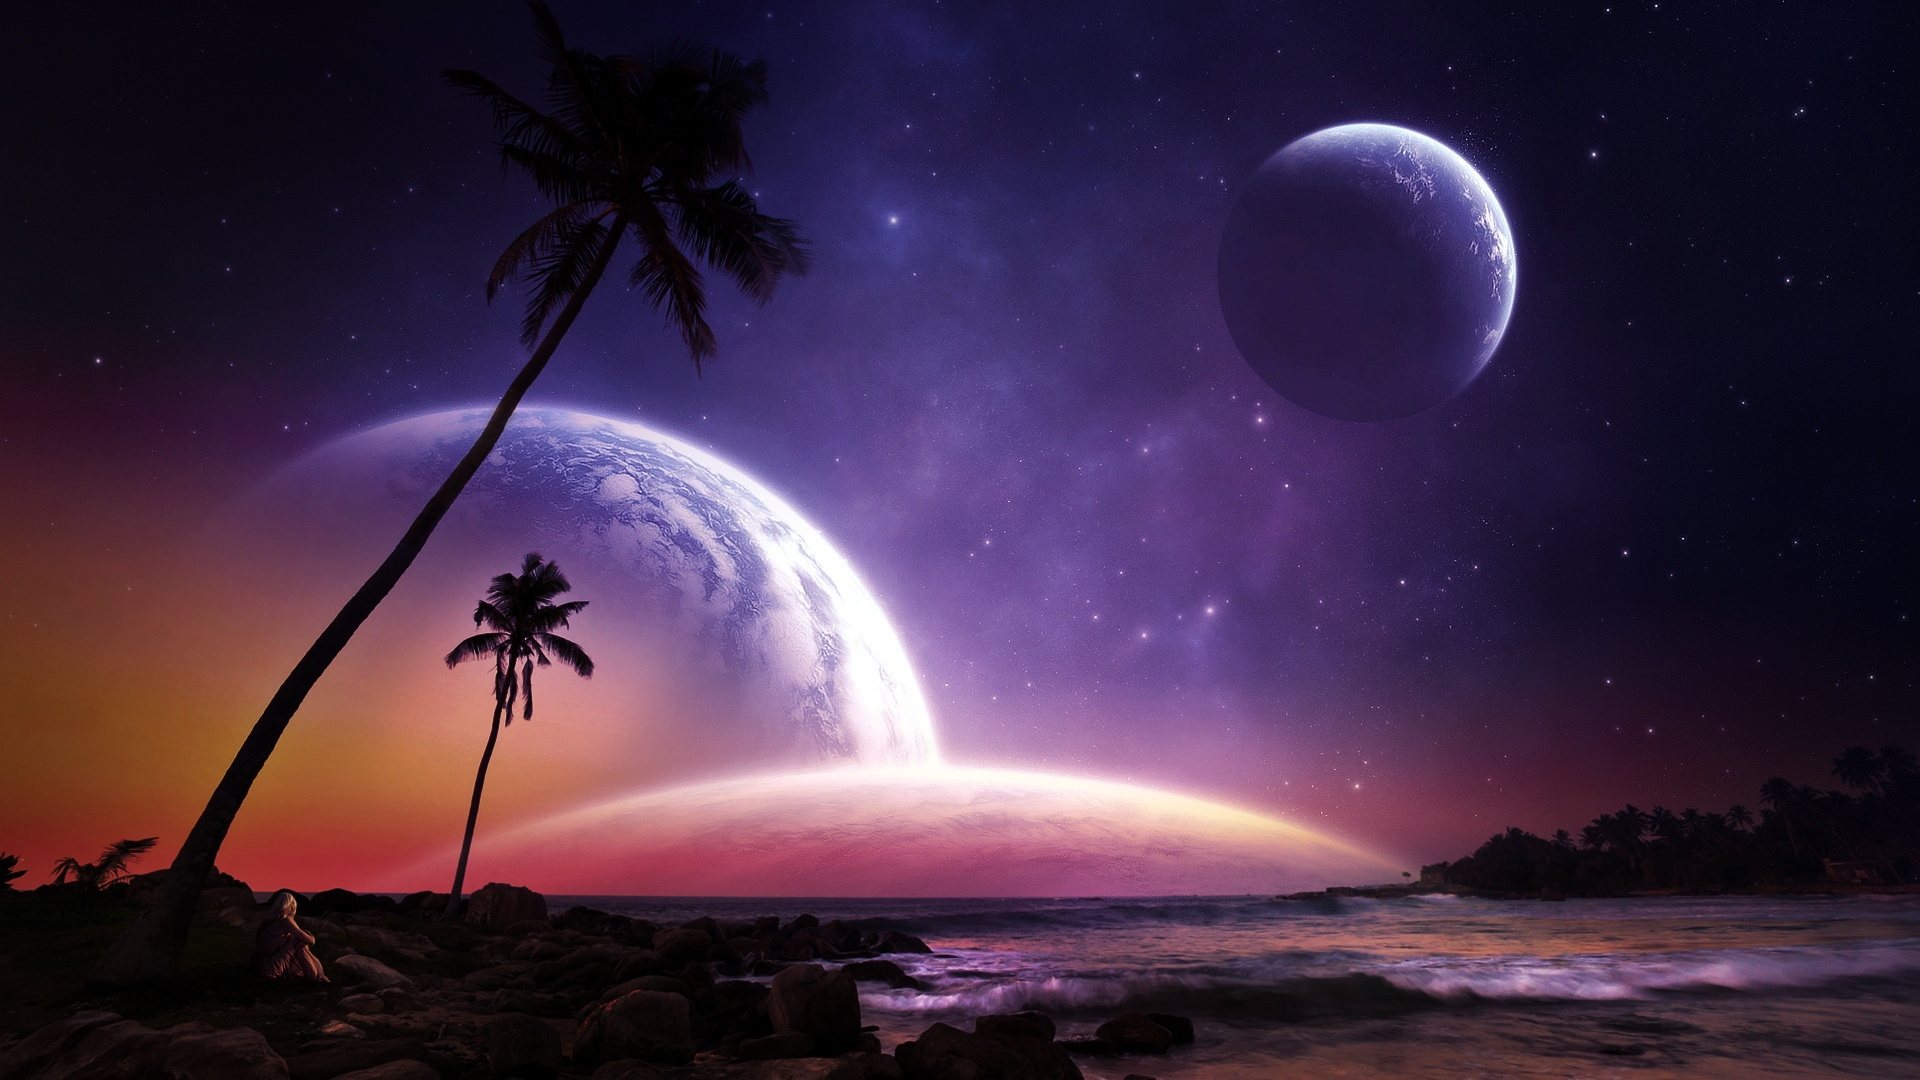 Красивые картинки фантастика космос